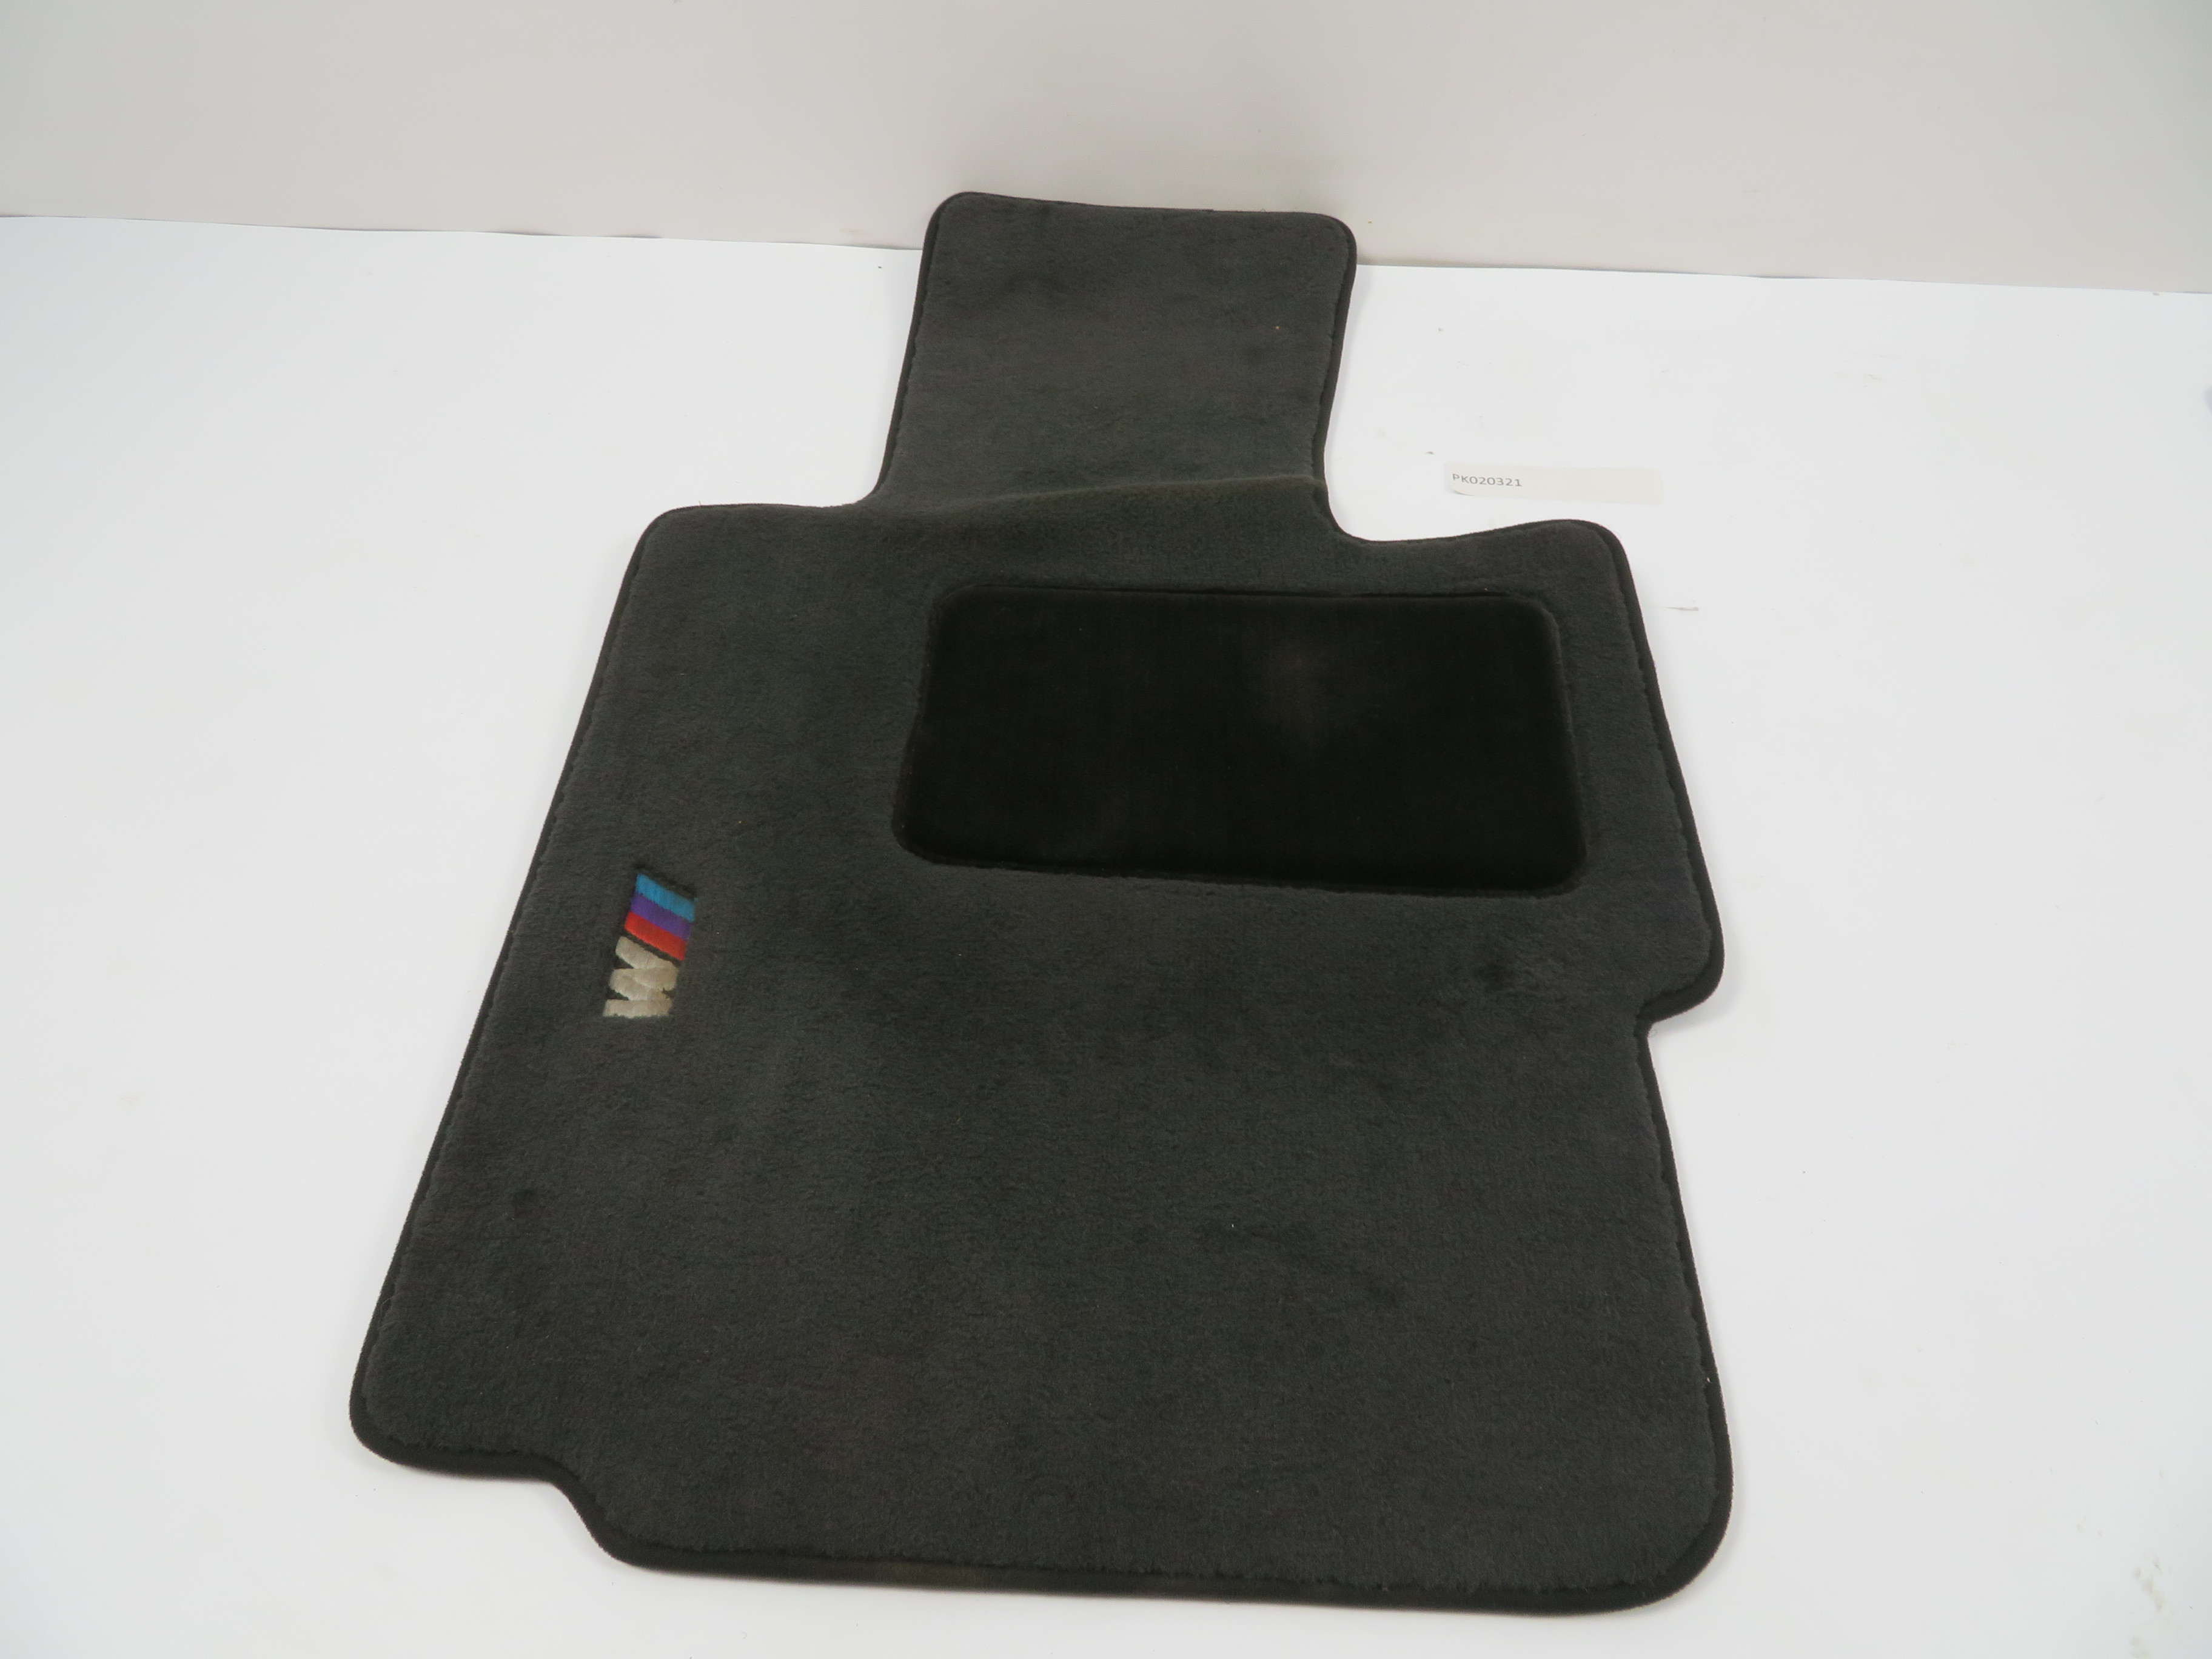 96 02 Bmw Z3 M Roadster E36 1104 Oem Genuine Floor Mats Carpet